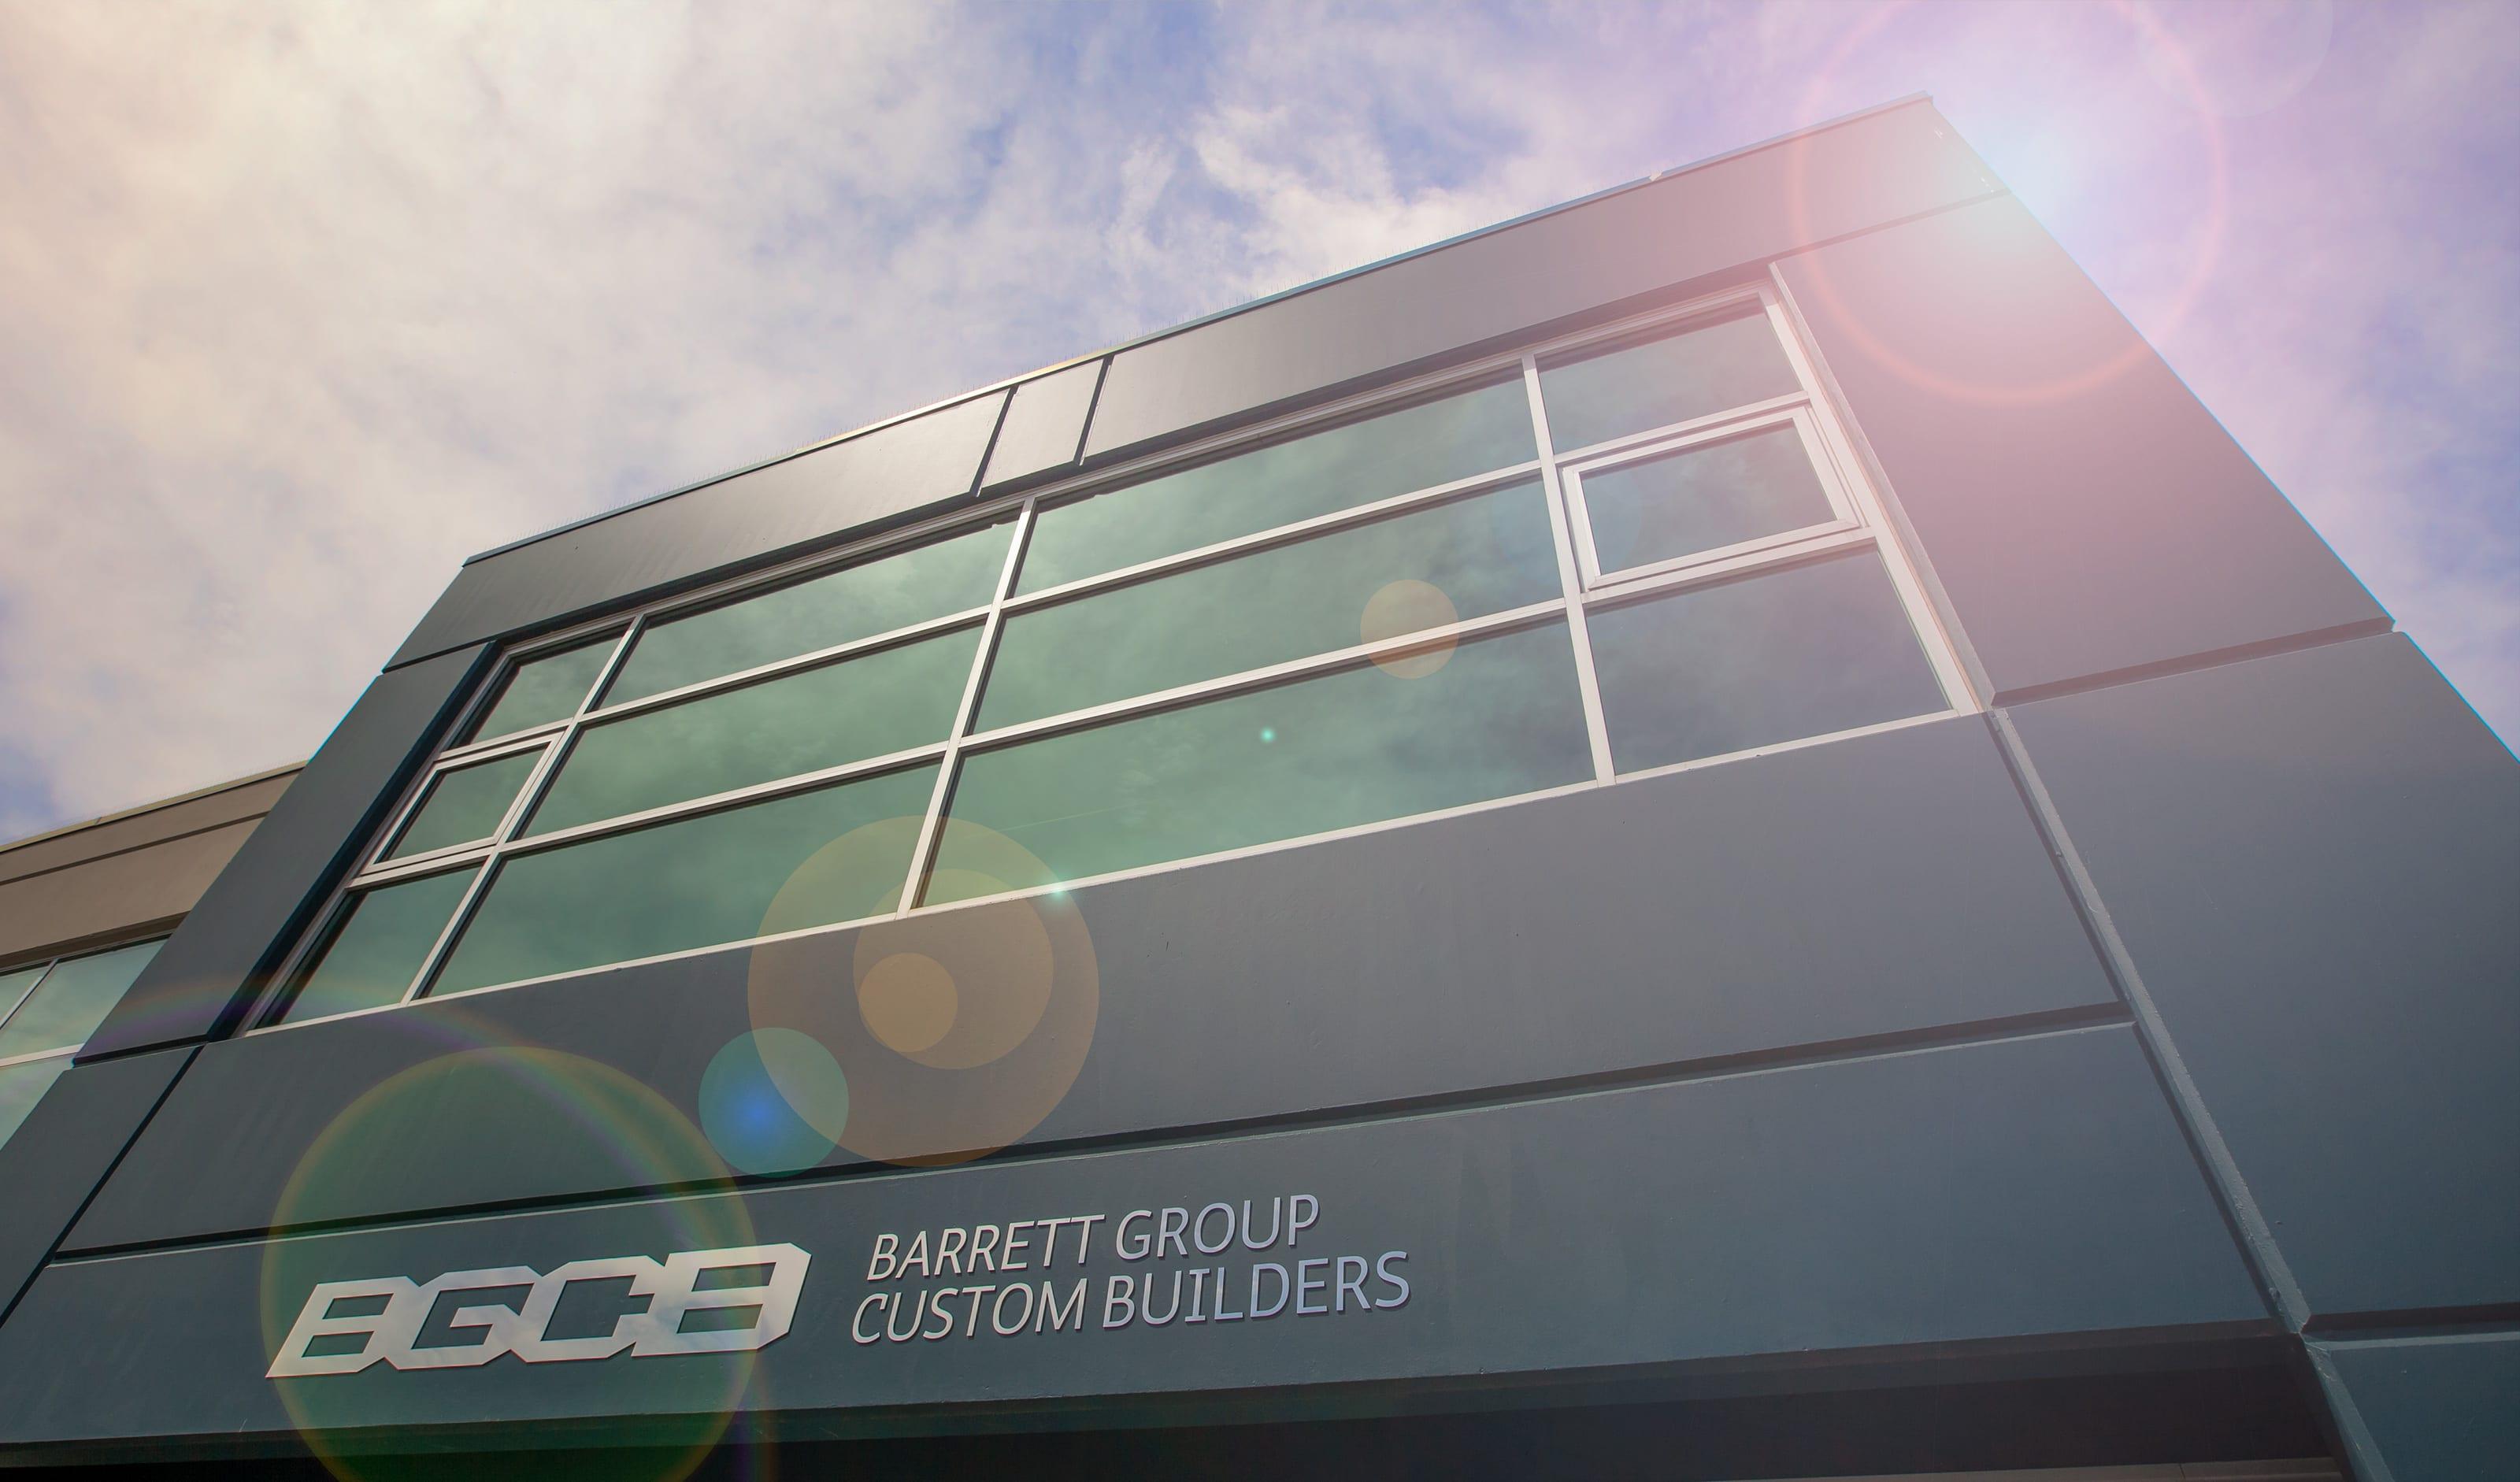 Barrett Group Office